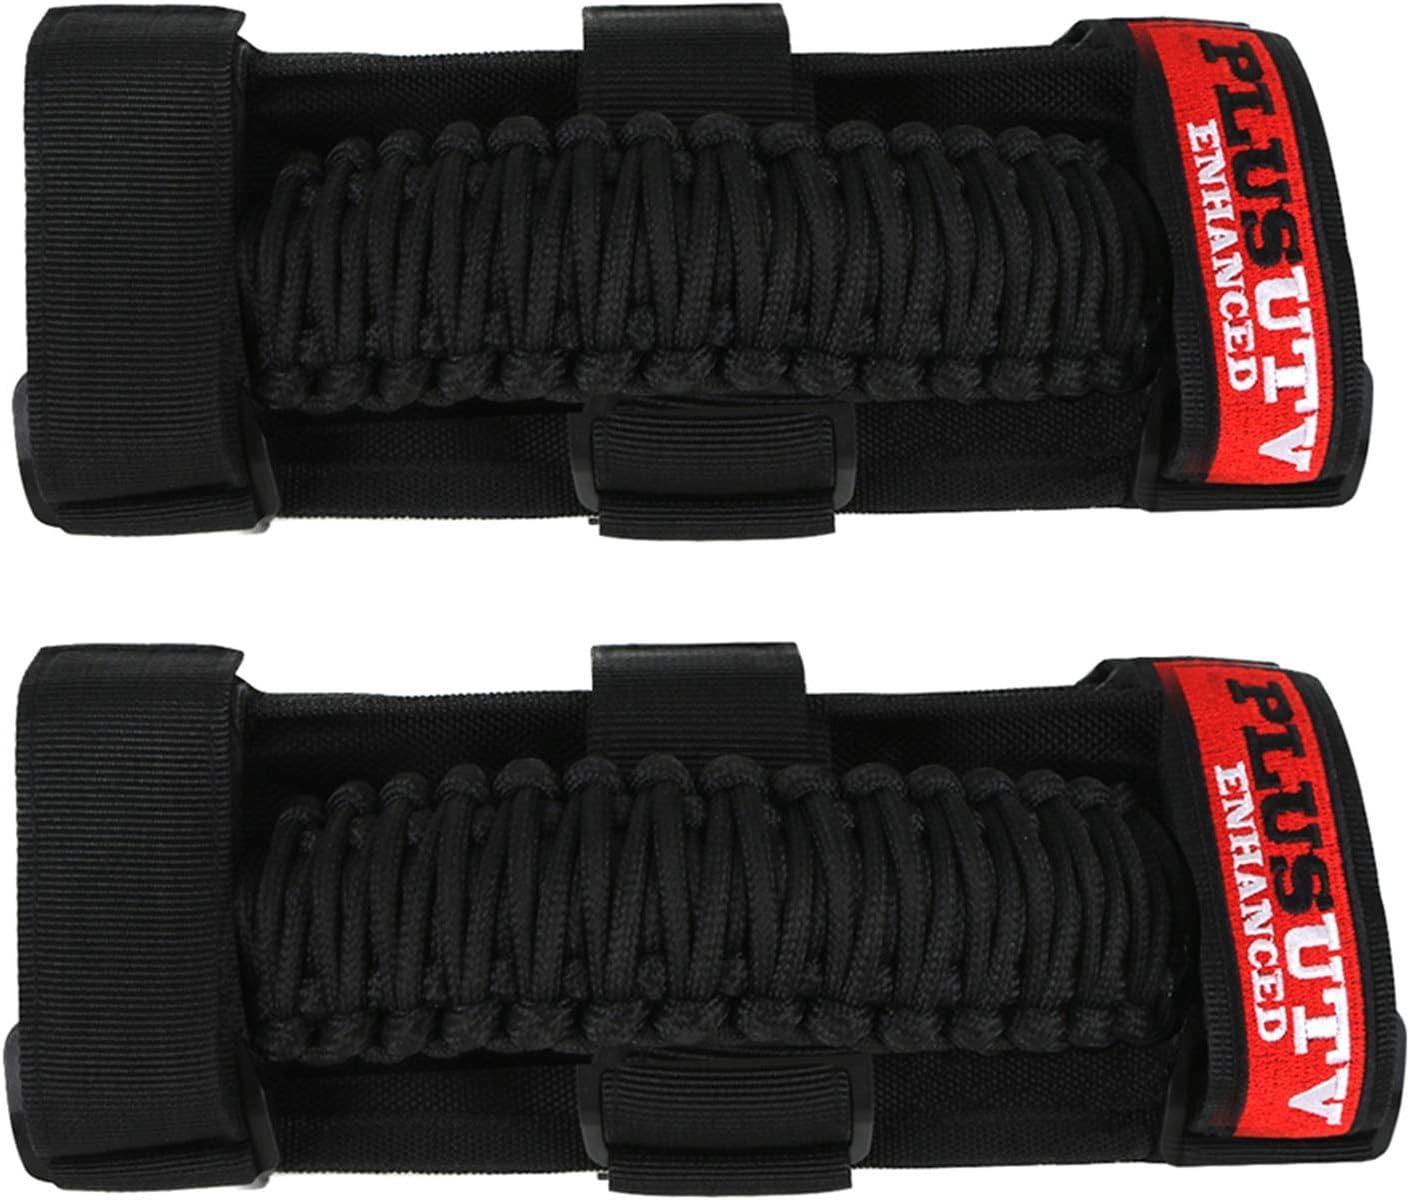 KEMIMOTO 2 Pack UTV Heavy Duty Roll Bar Grab Handle Grips Grab bar Hand Hold for Polaris RZR Ranger Can Am Kawasaki Honda Pioneer Talon Wildcat